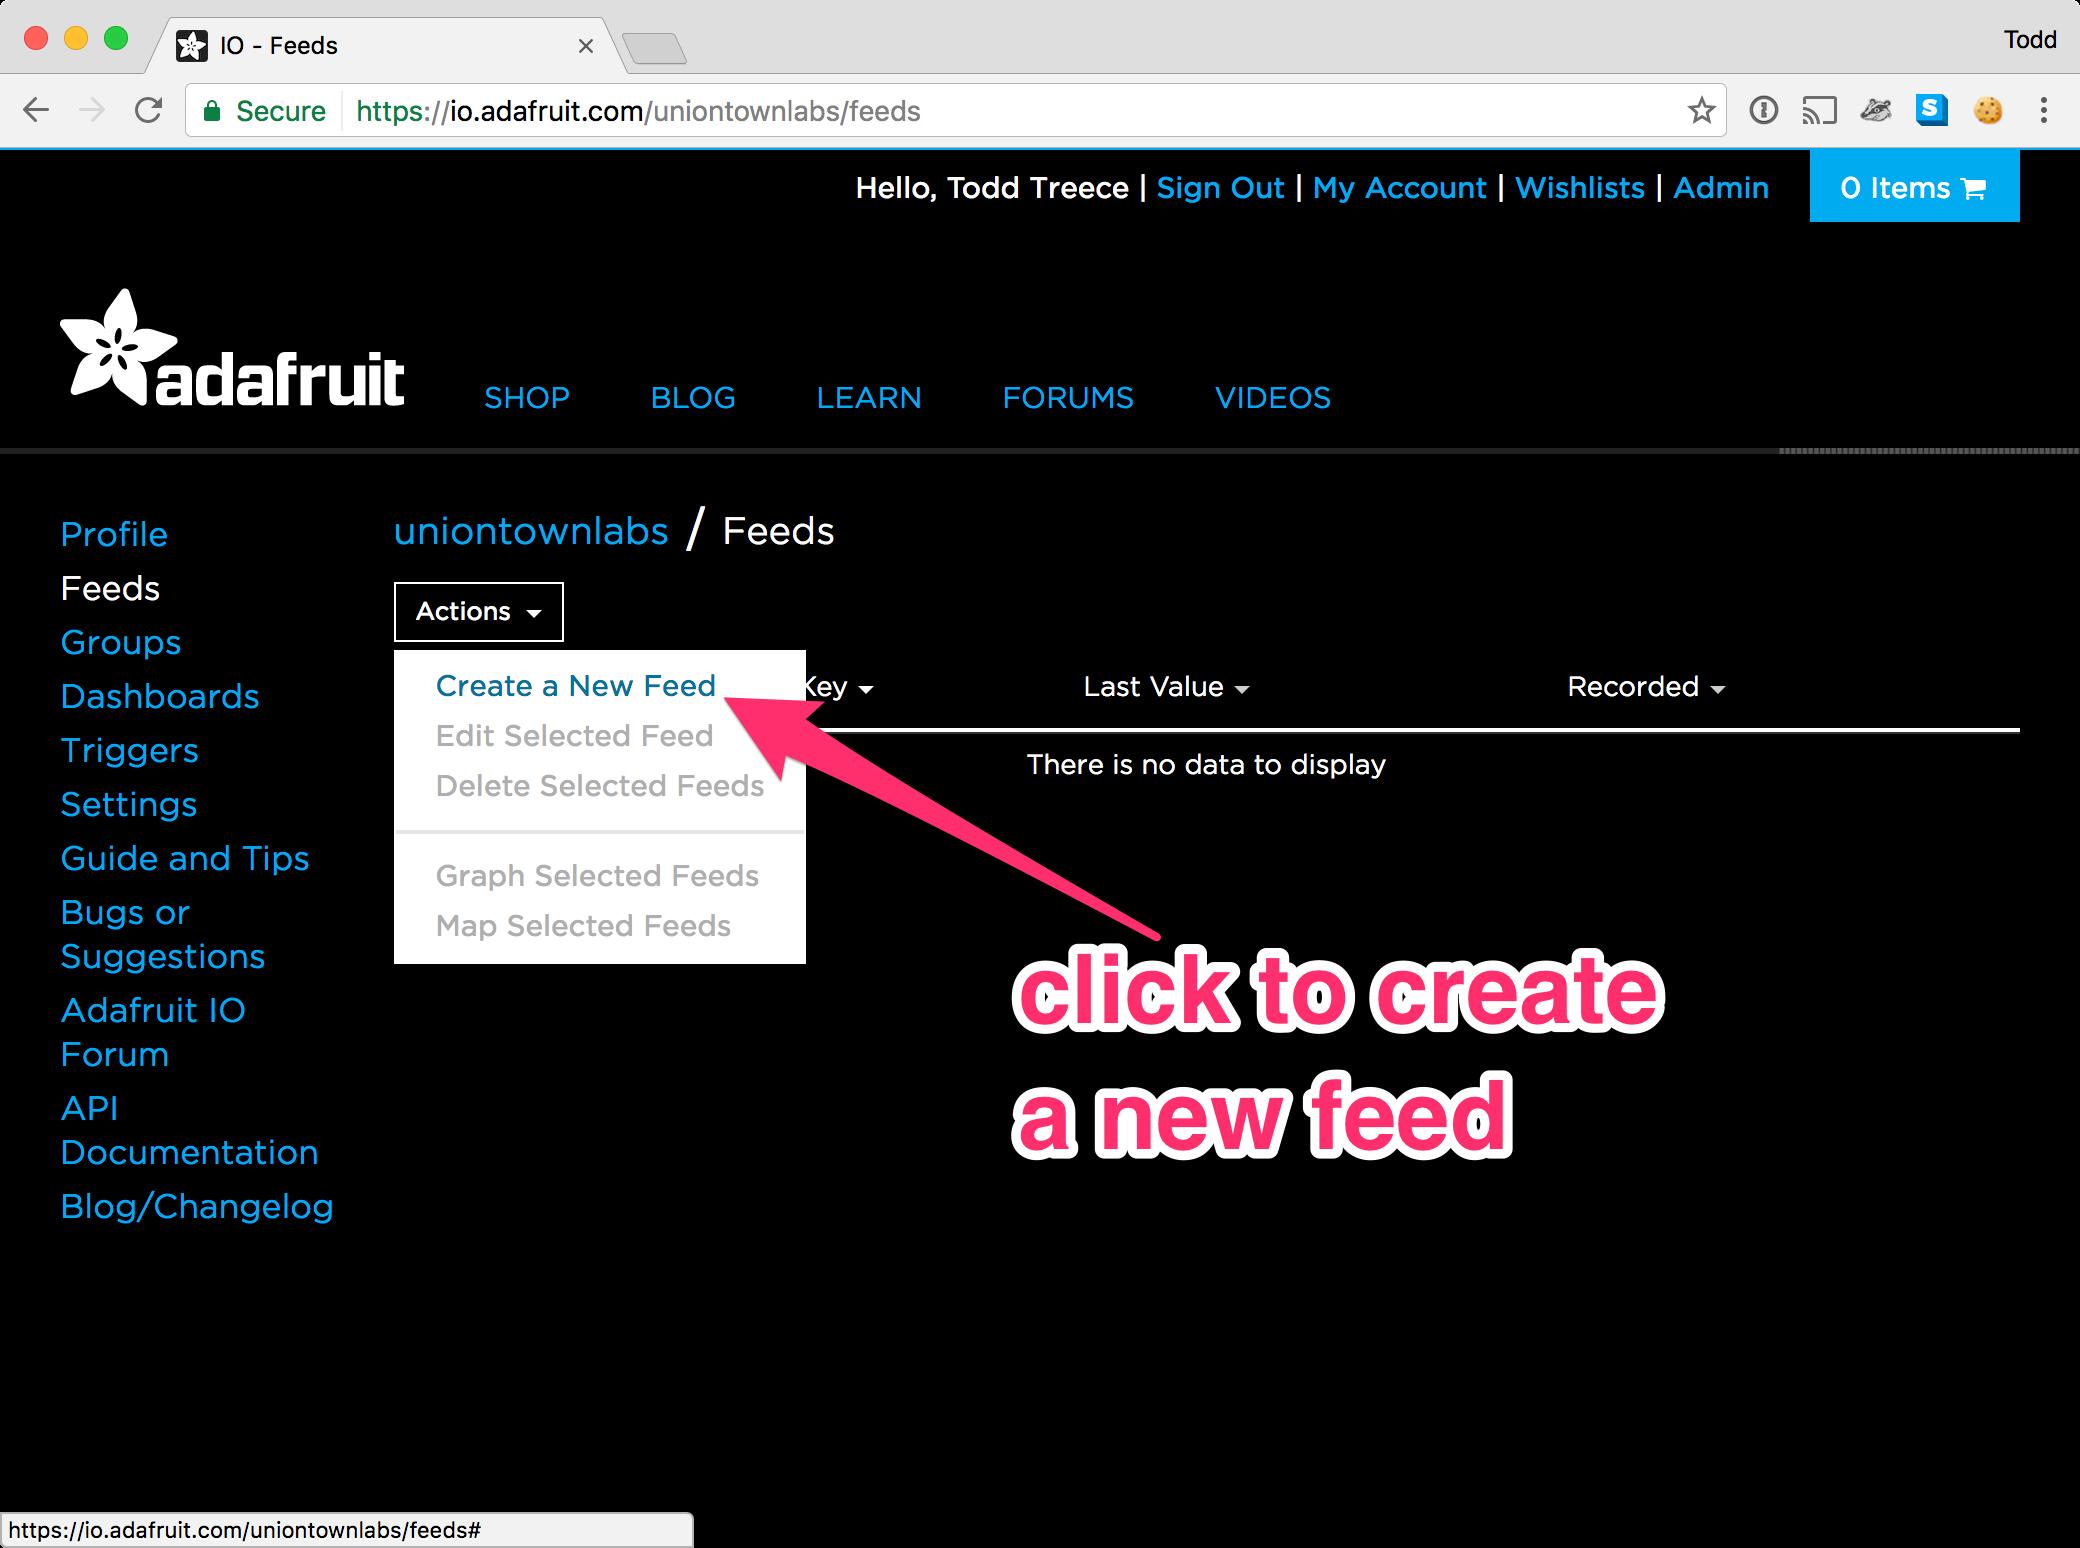 adafruit_io_00_create_feed_button.png